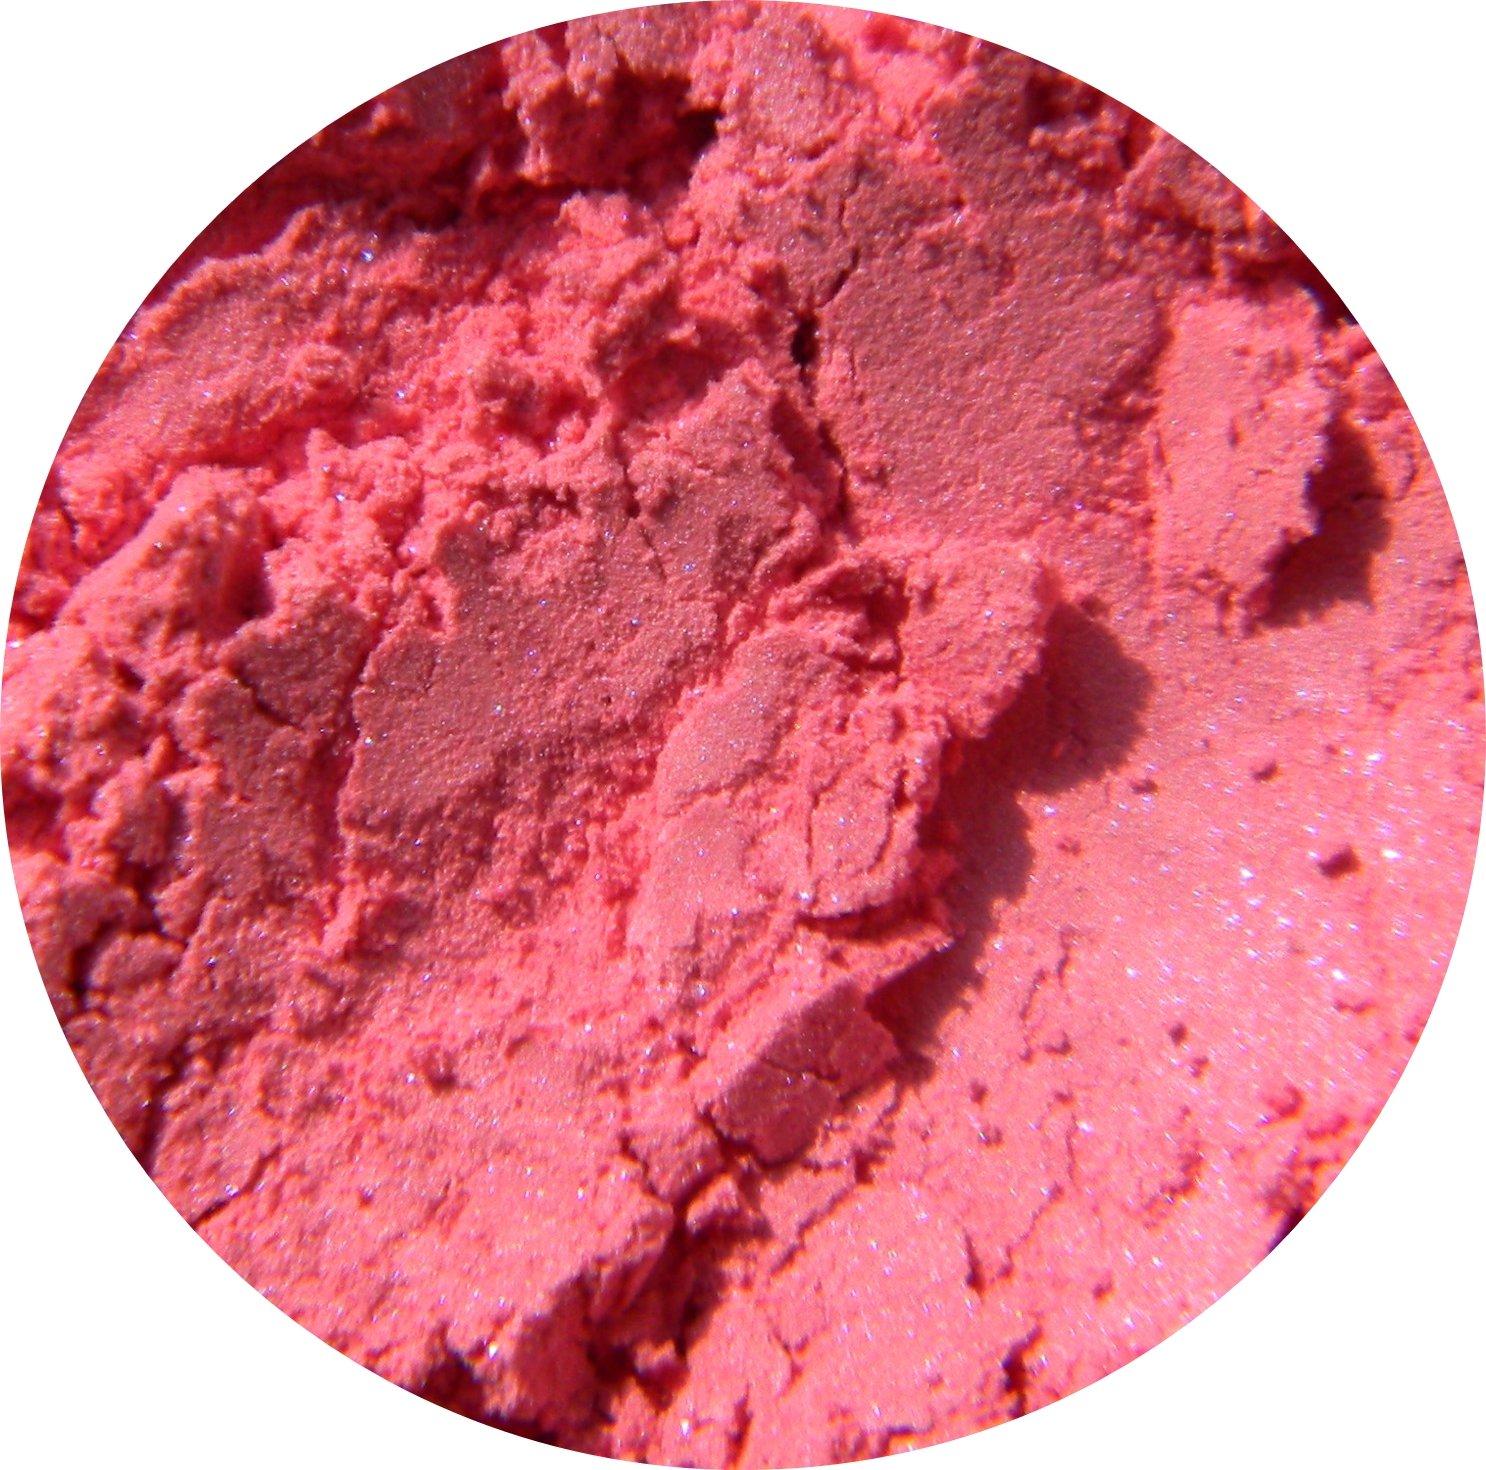 Virgin DuoChrome Blush (full size) � Darling Girl Cosmetics